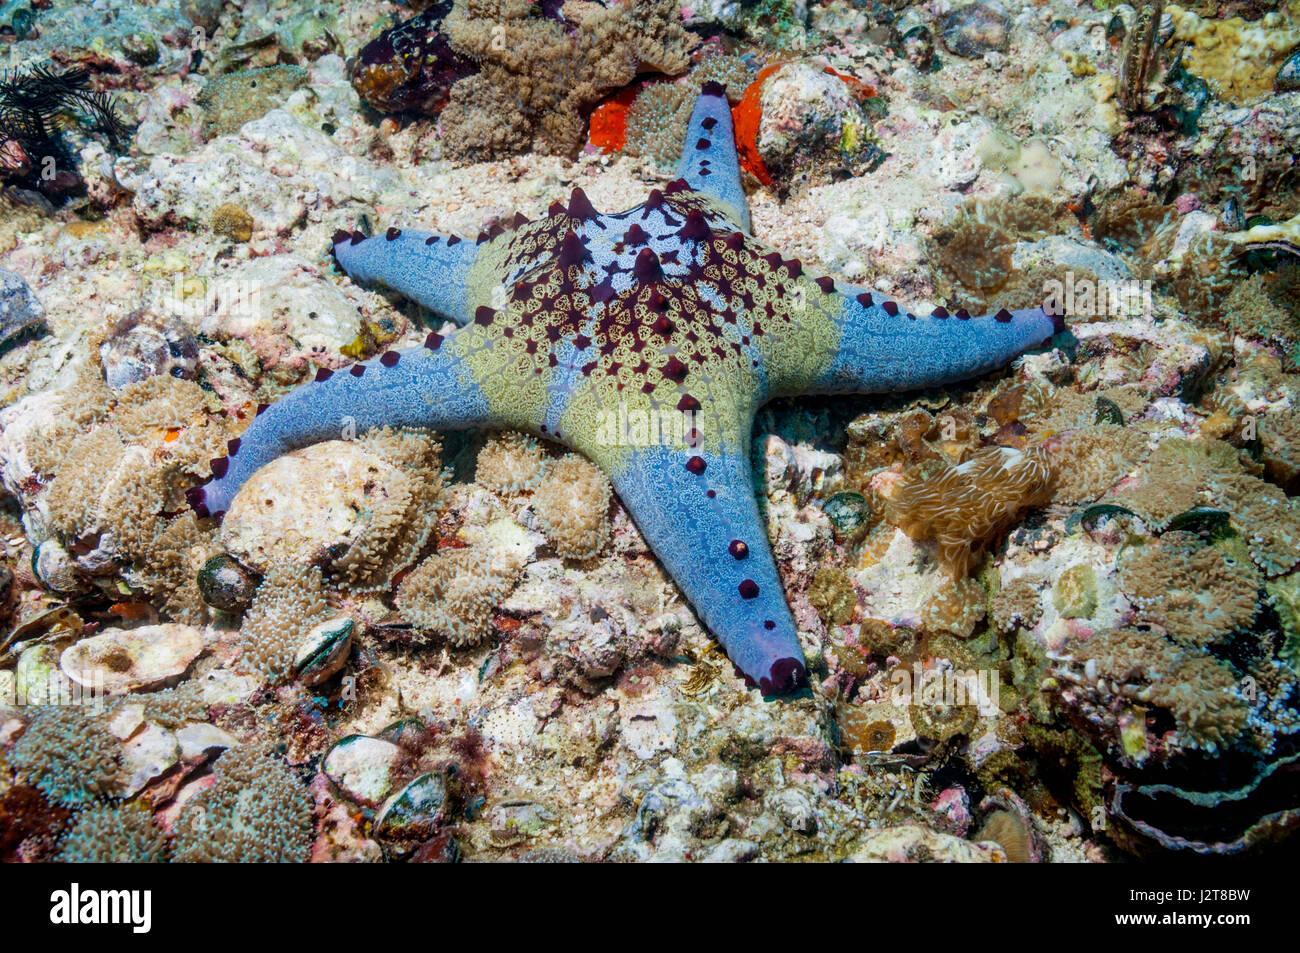 Honeycomb or Cushion starfish [Pentaceraster alveolatus].  Oreasteridae.  Malapascua Island, Philippines. - Stock Image